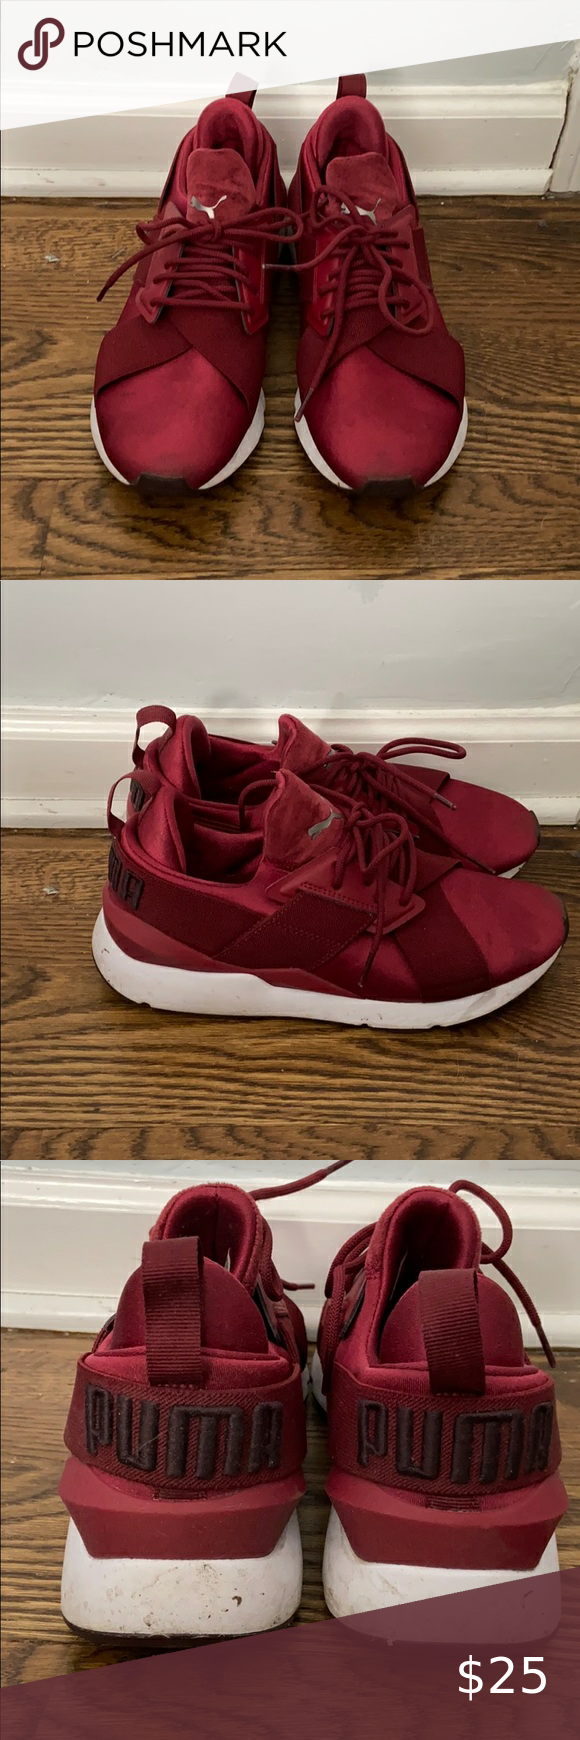 Puma Muse 2 Satin Sneakers Sneakers Casual Sneakers Puma